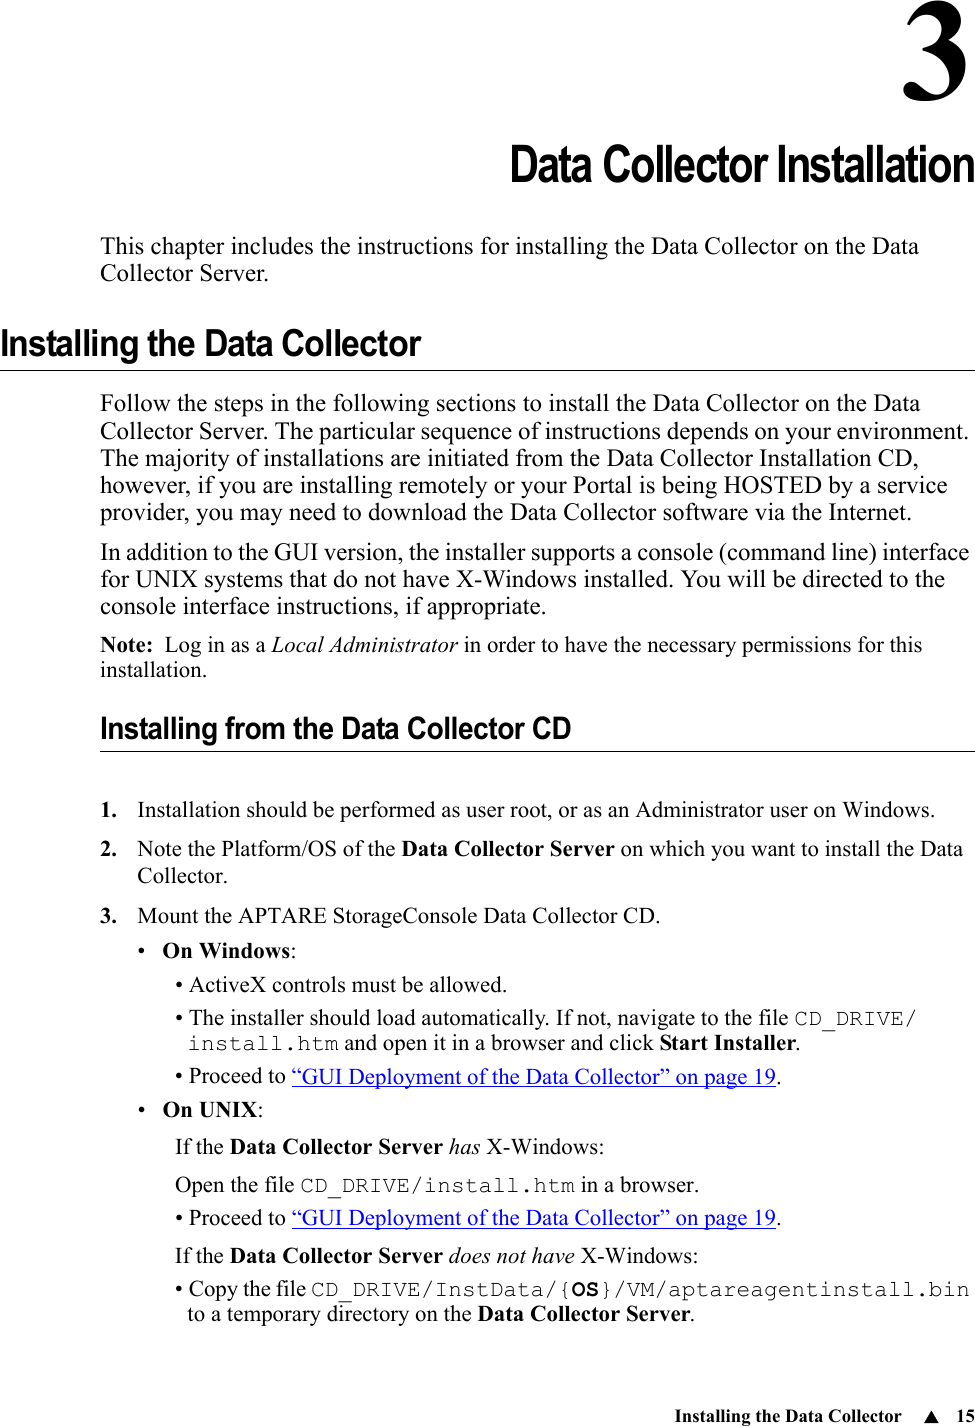 Ibm Aptare 6 5 Users Manual DataCollectorTSM